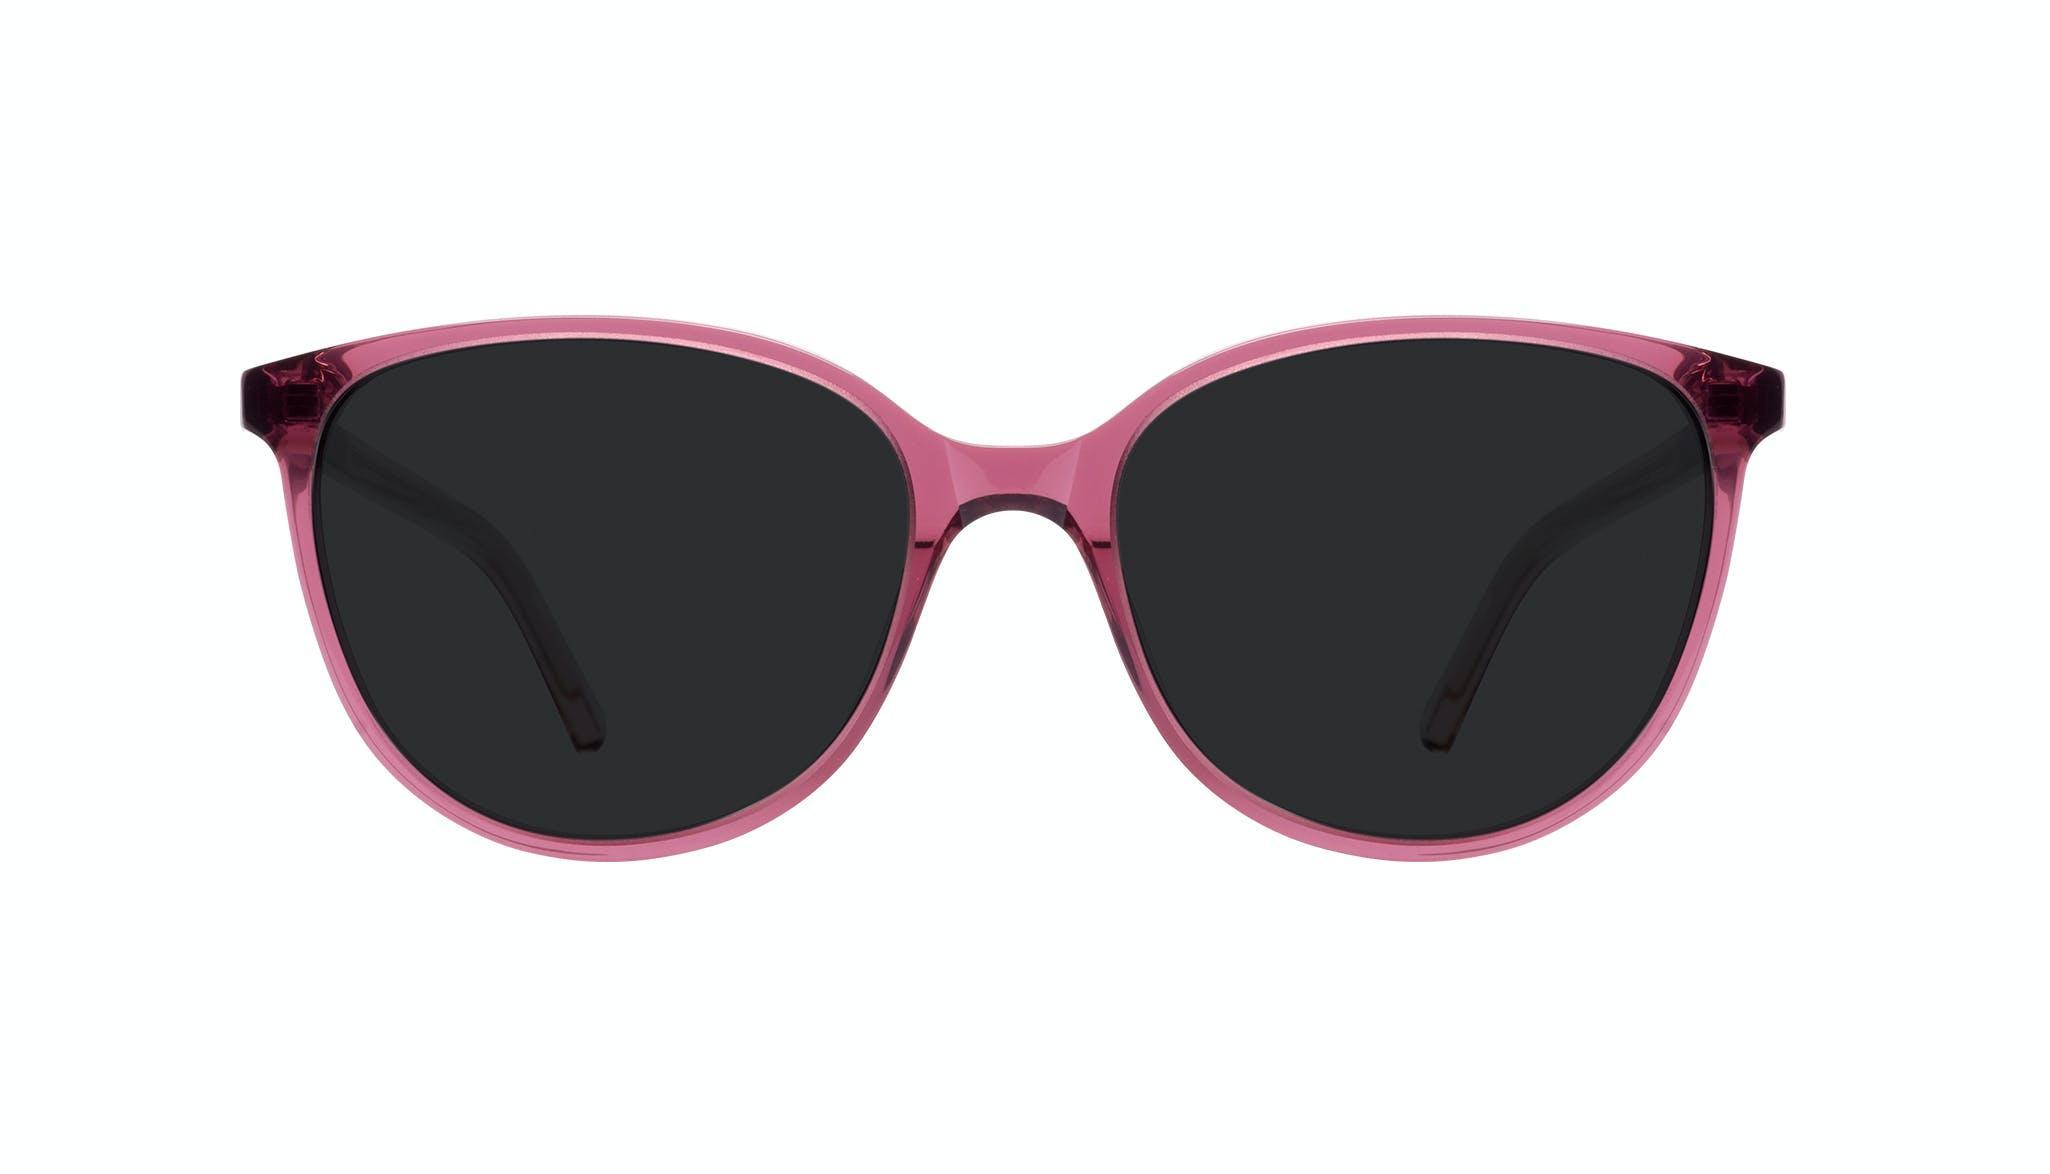 Affordable Fashion Glasses Round Sunglasses Women Imagine Petite Berry